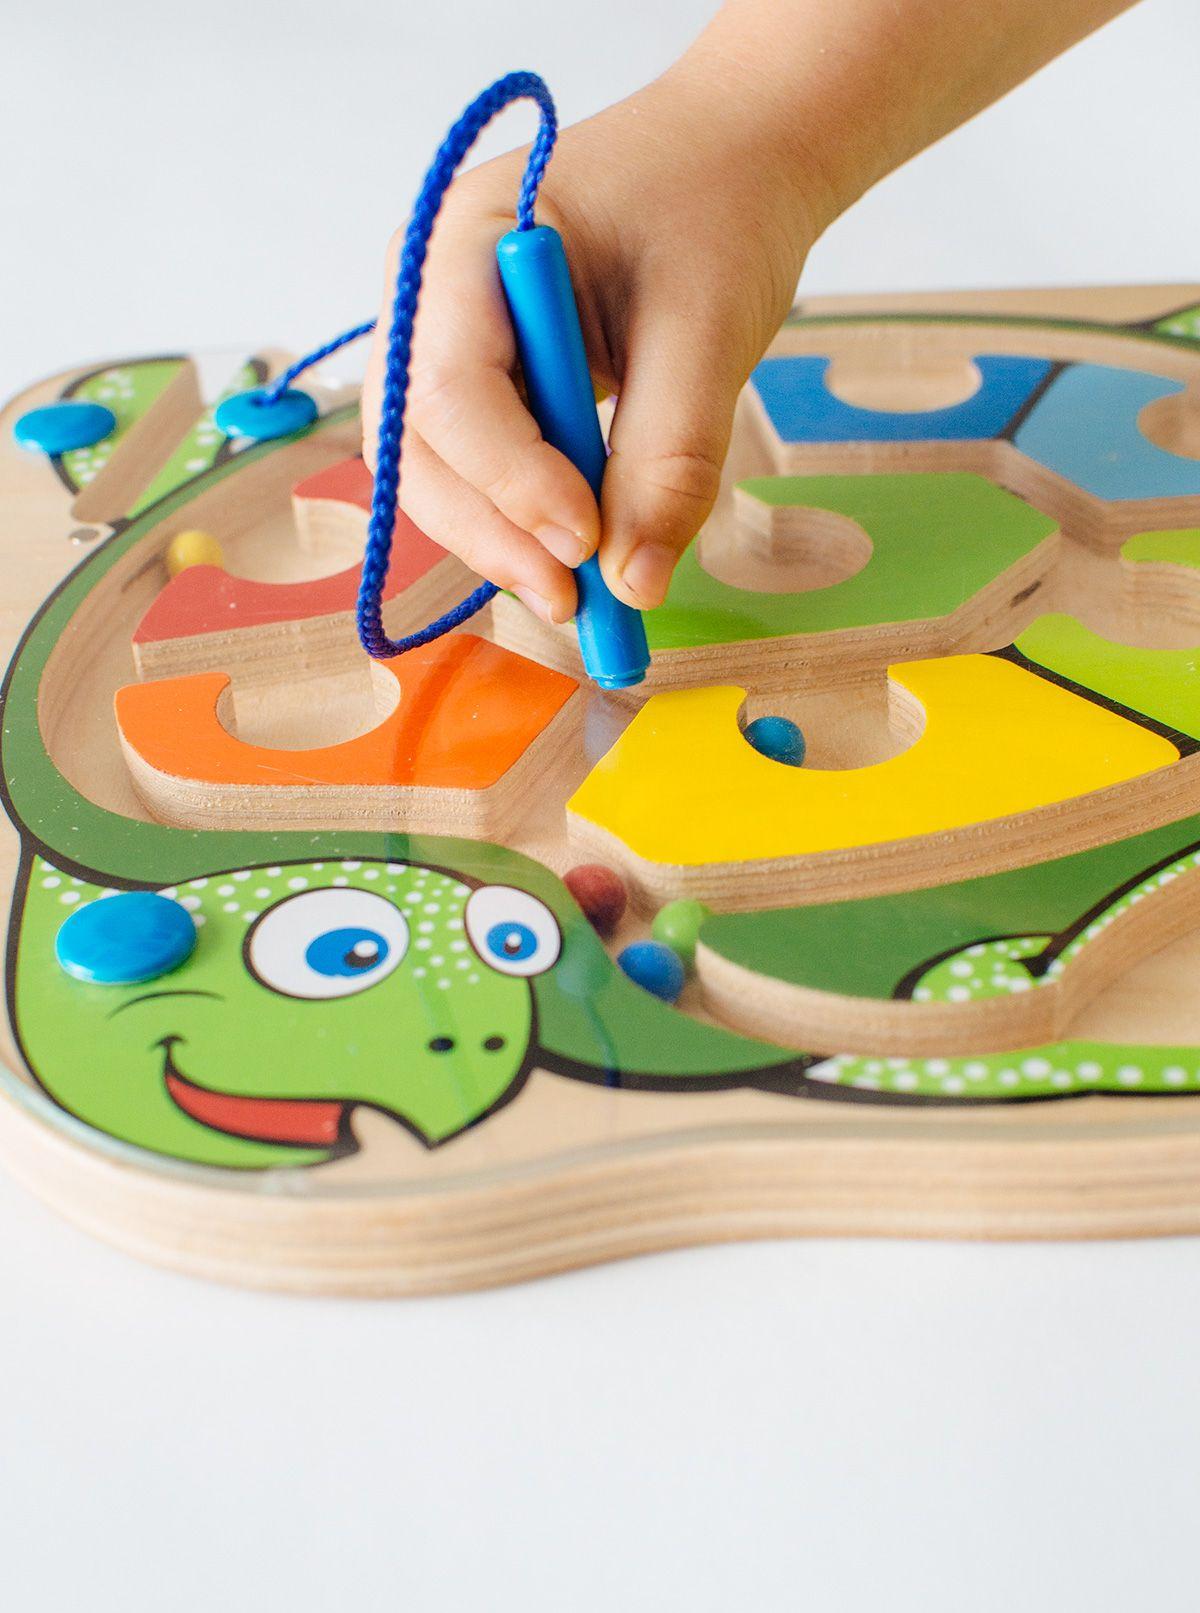 Juguetes Para Bebes De 20 Meses.Juguetes Para Ninos De 2 Anos Cual Debo Elegir